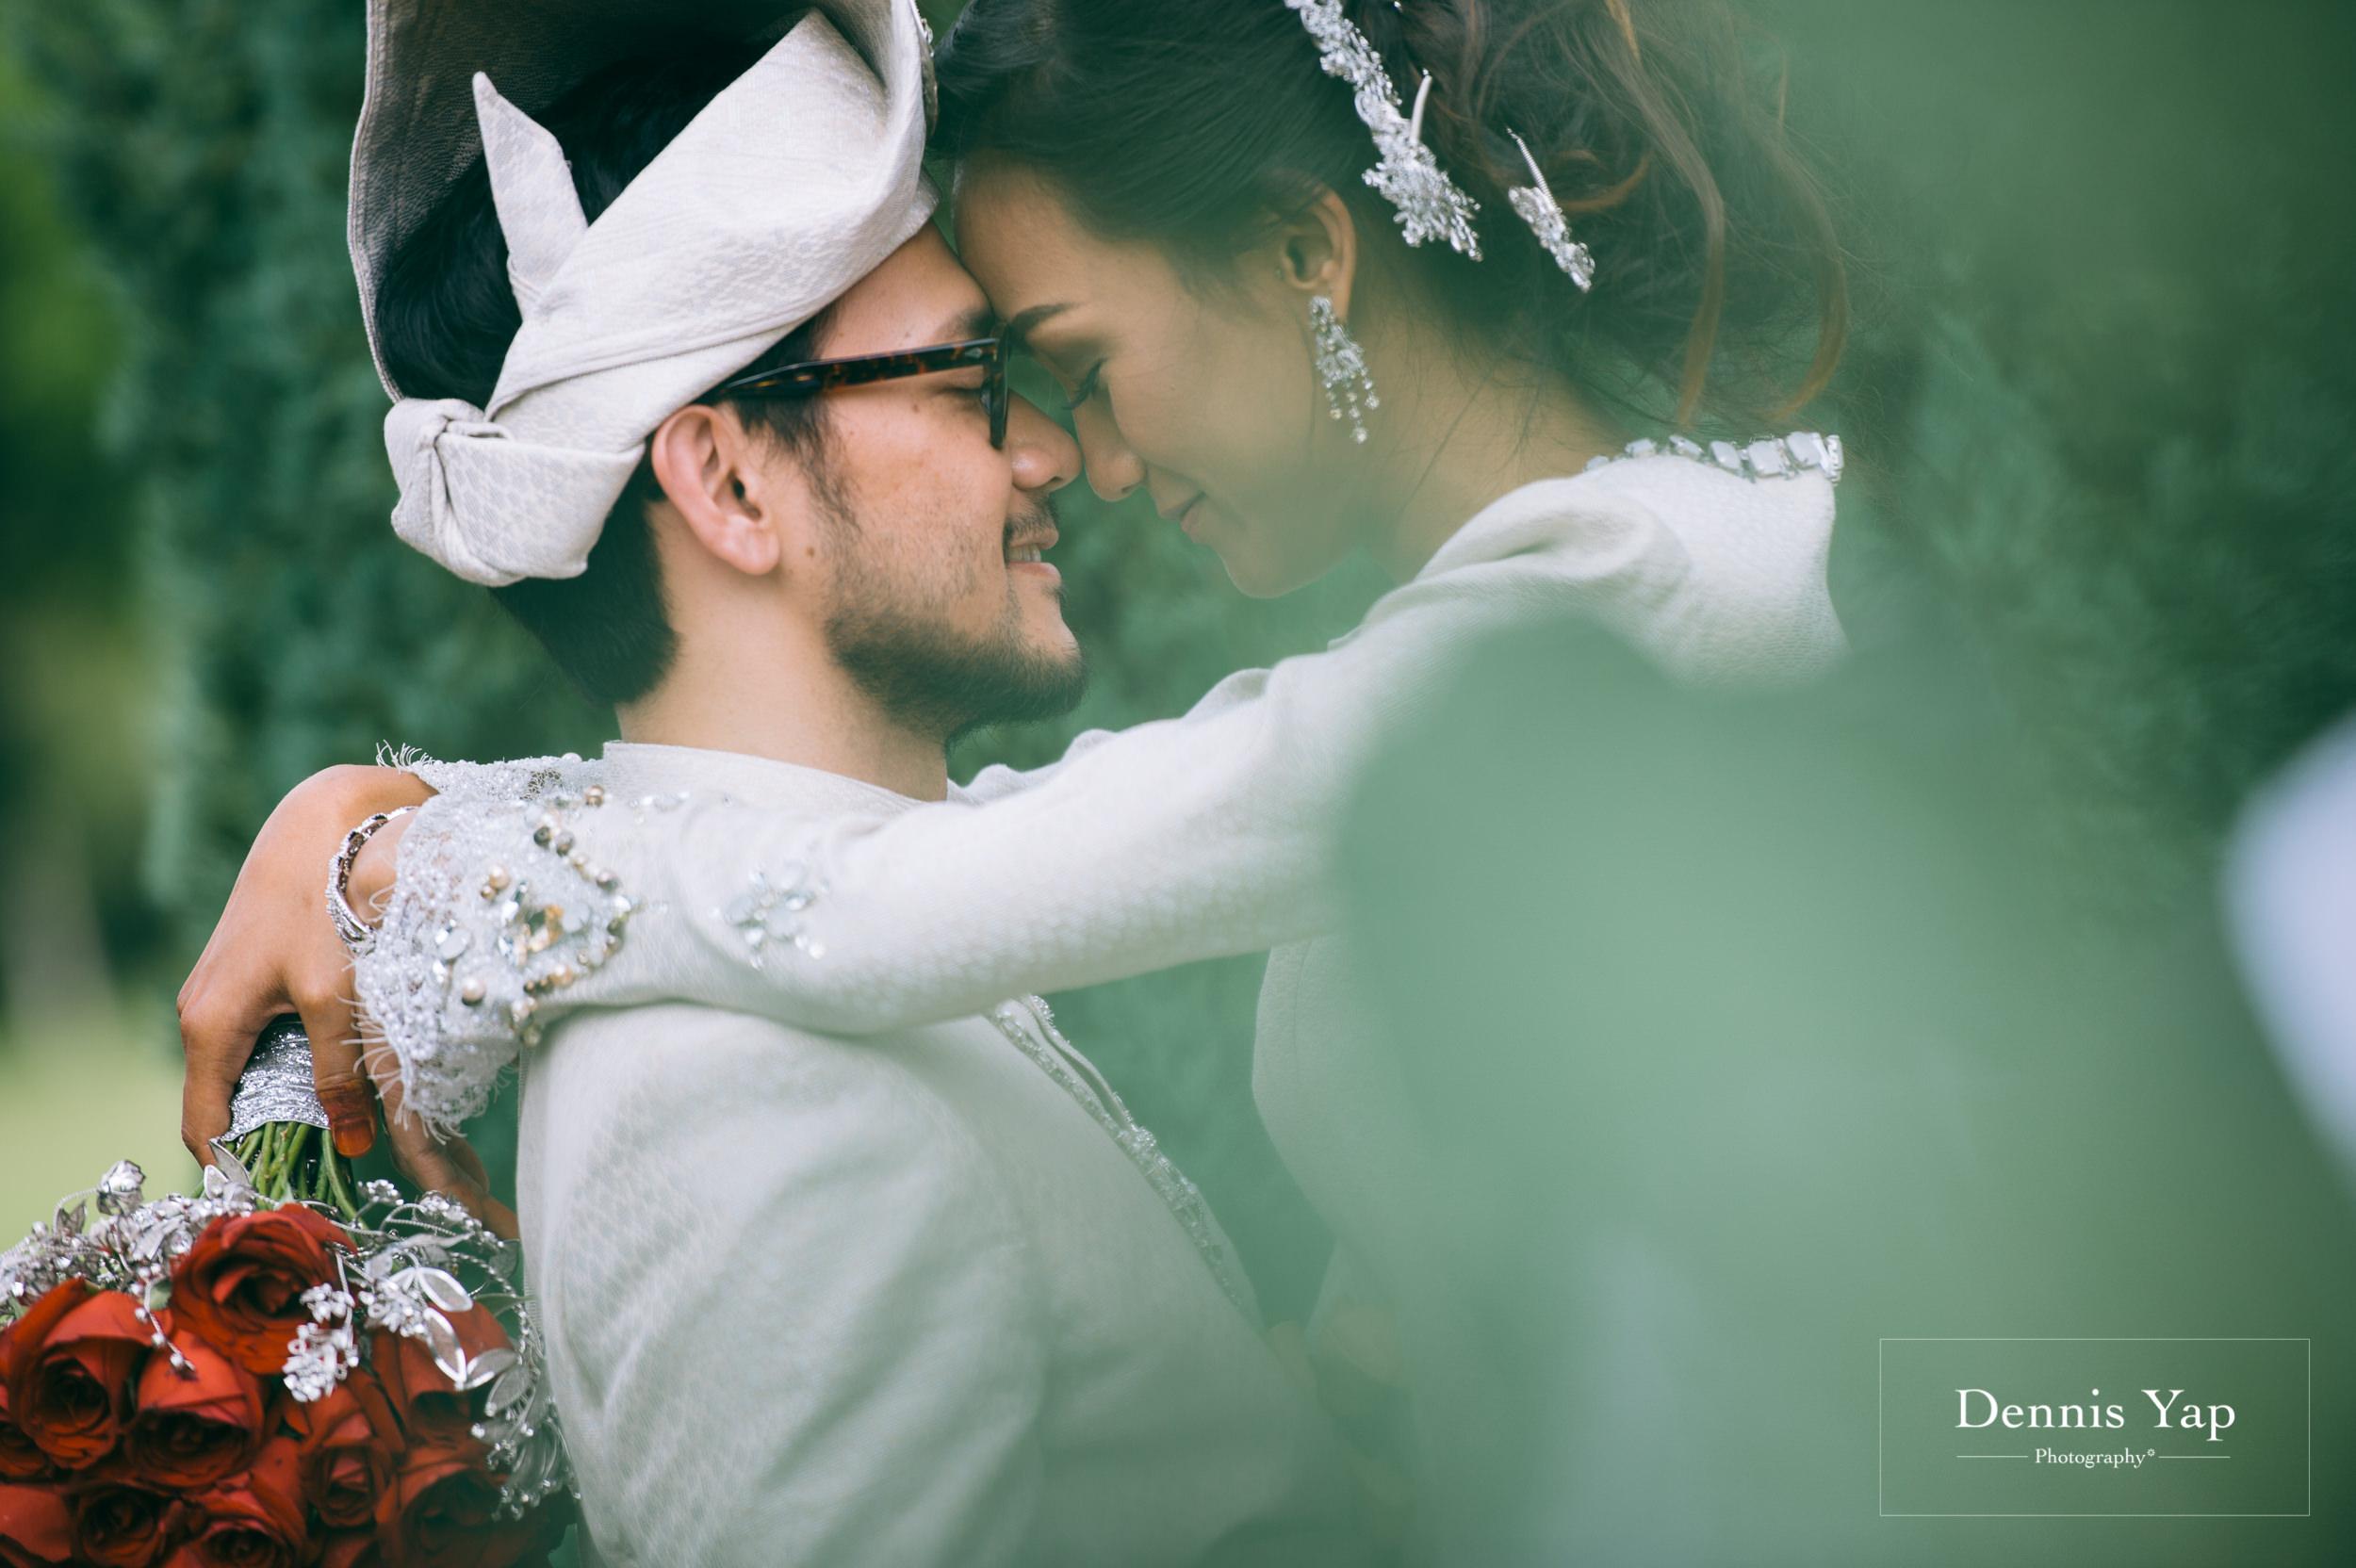 zarif hanalili malay wedding blessing ceremony dennis yap photography-26.jpg